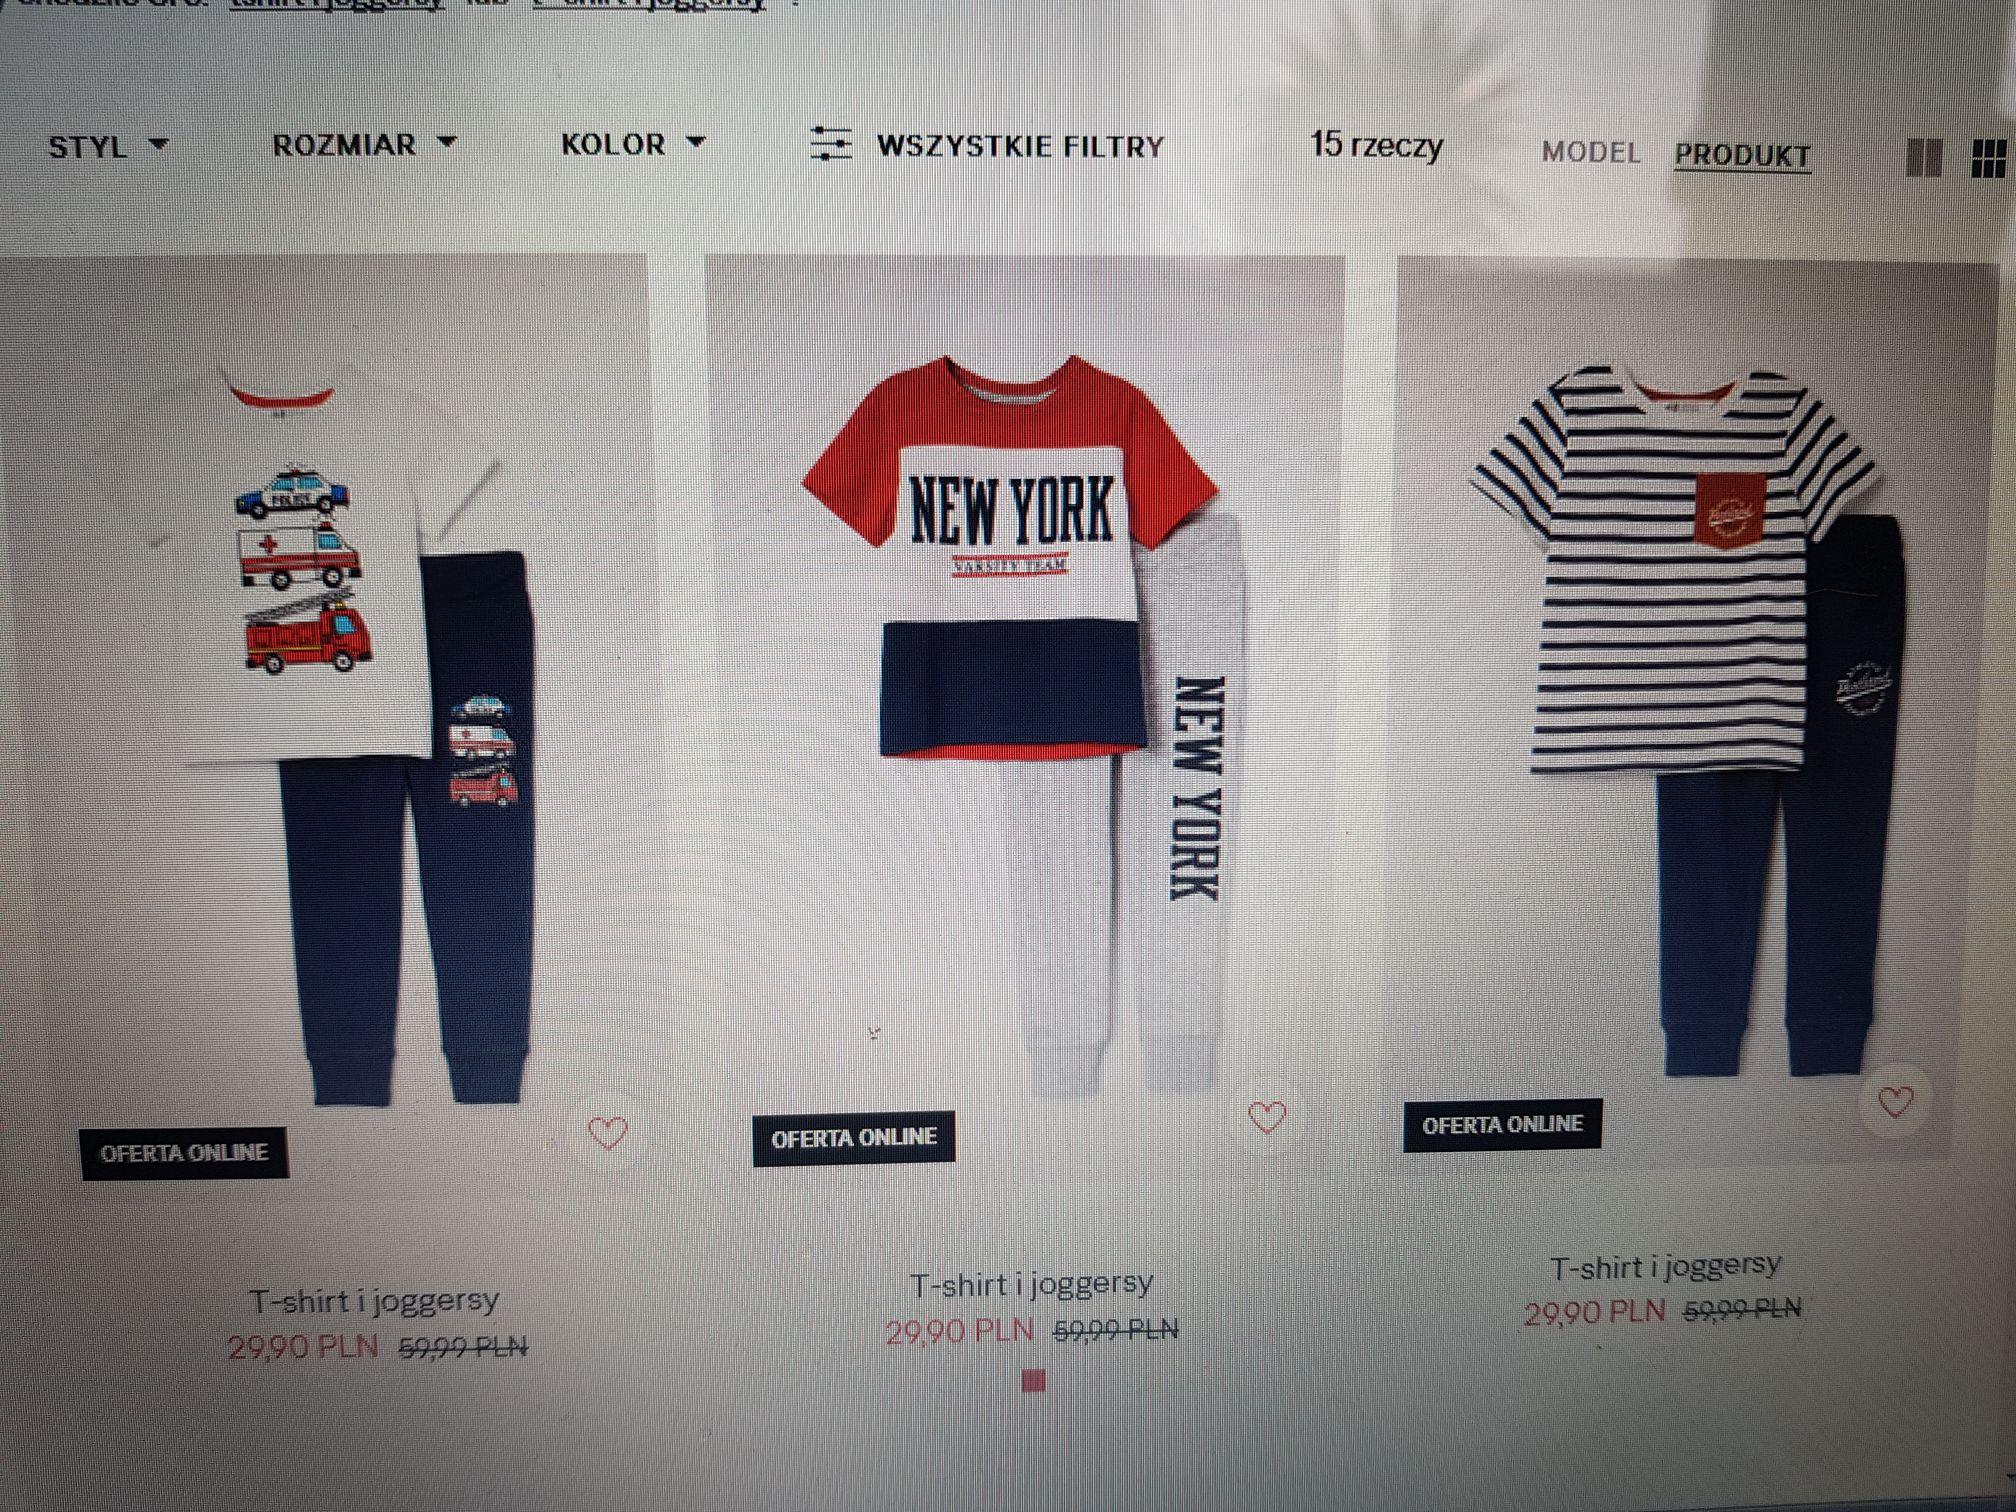 H&M Komplet T-shirt i joggersy